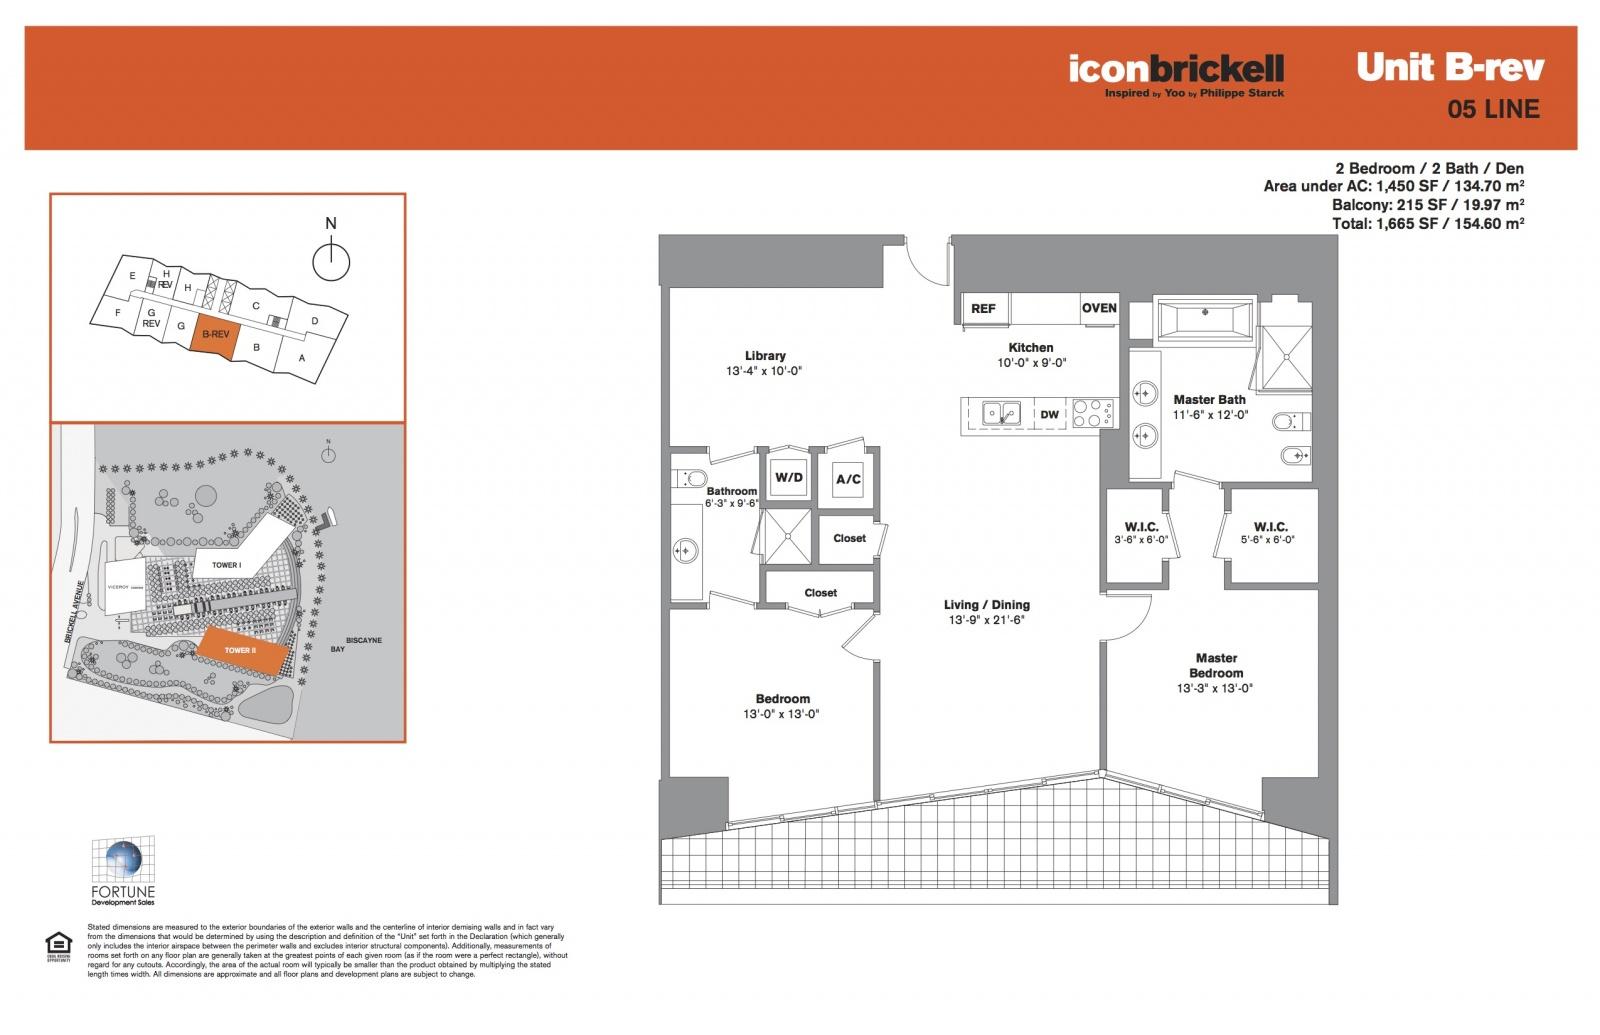 Icon Brickell Two, line 05 floor plan